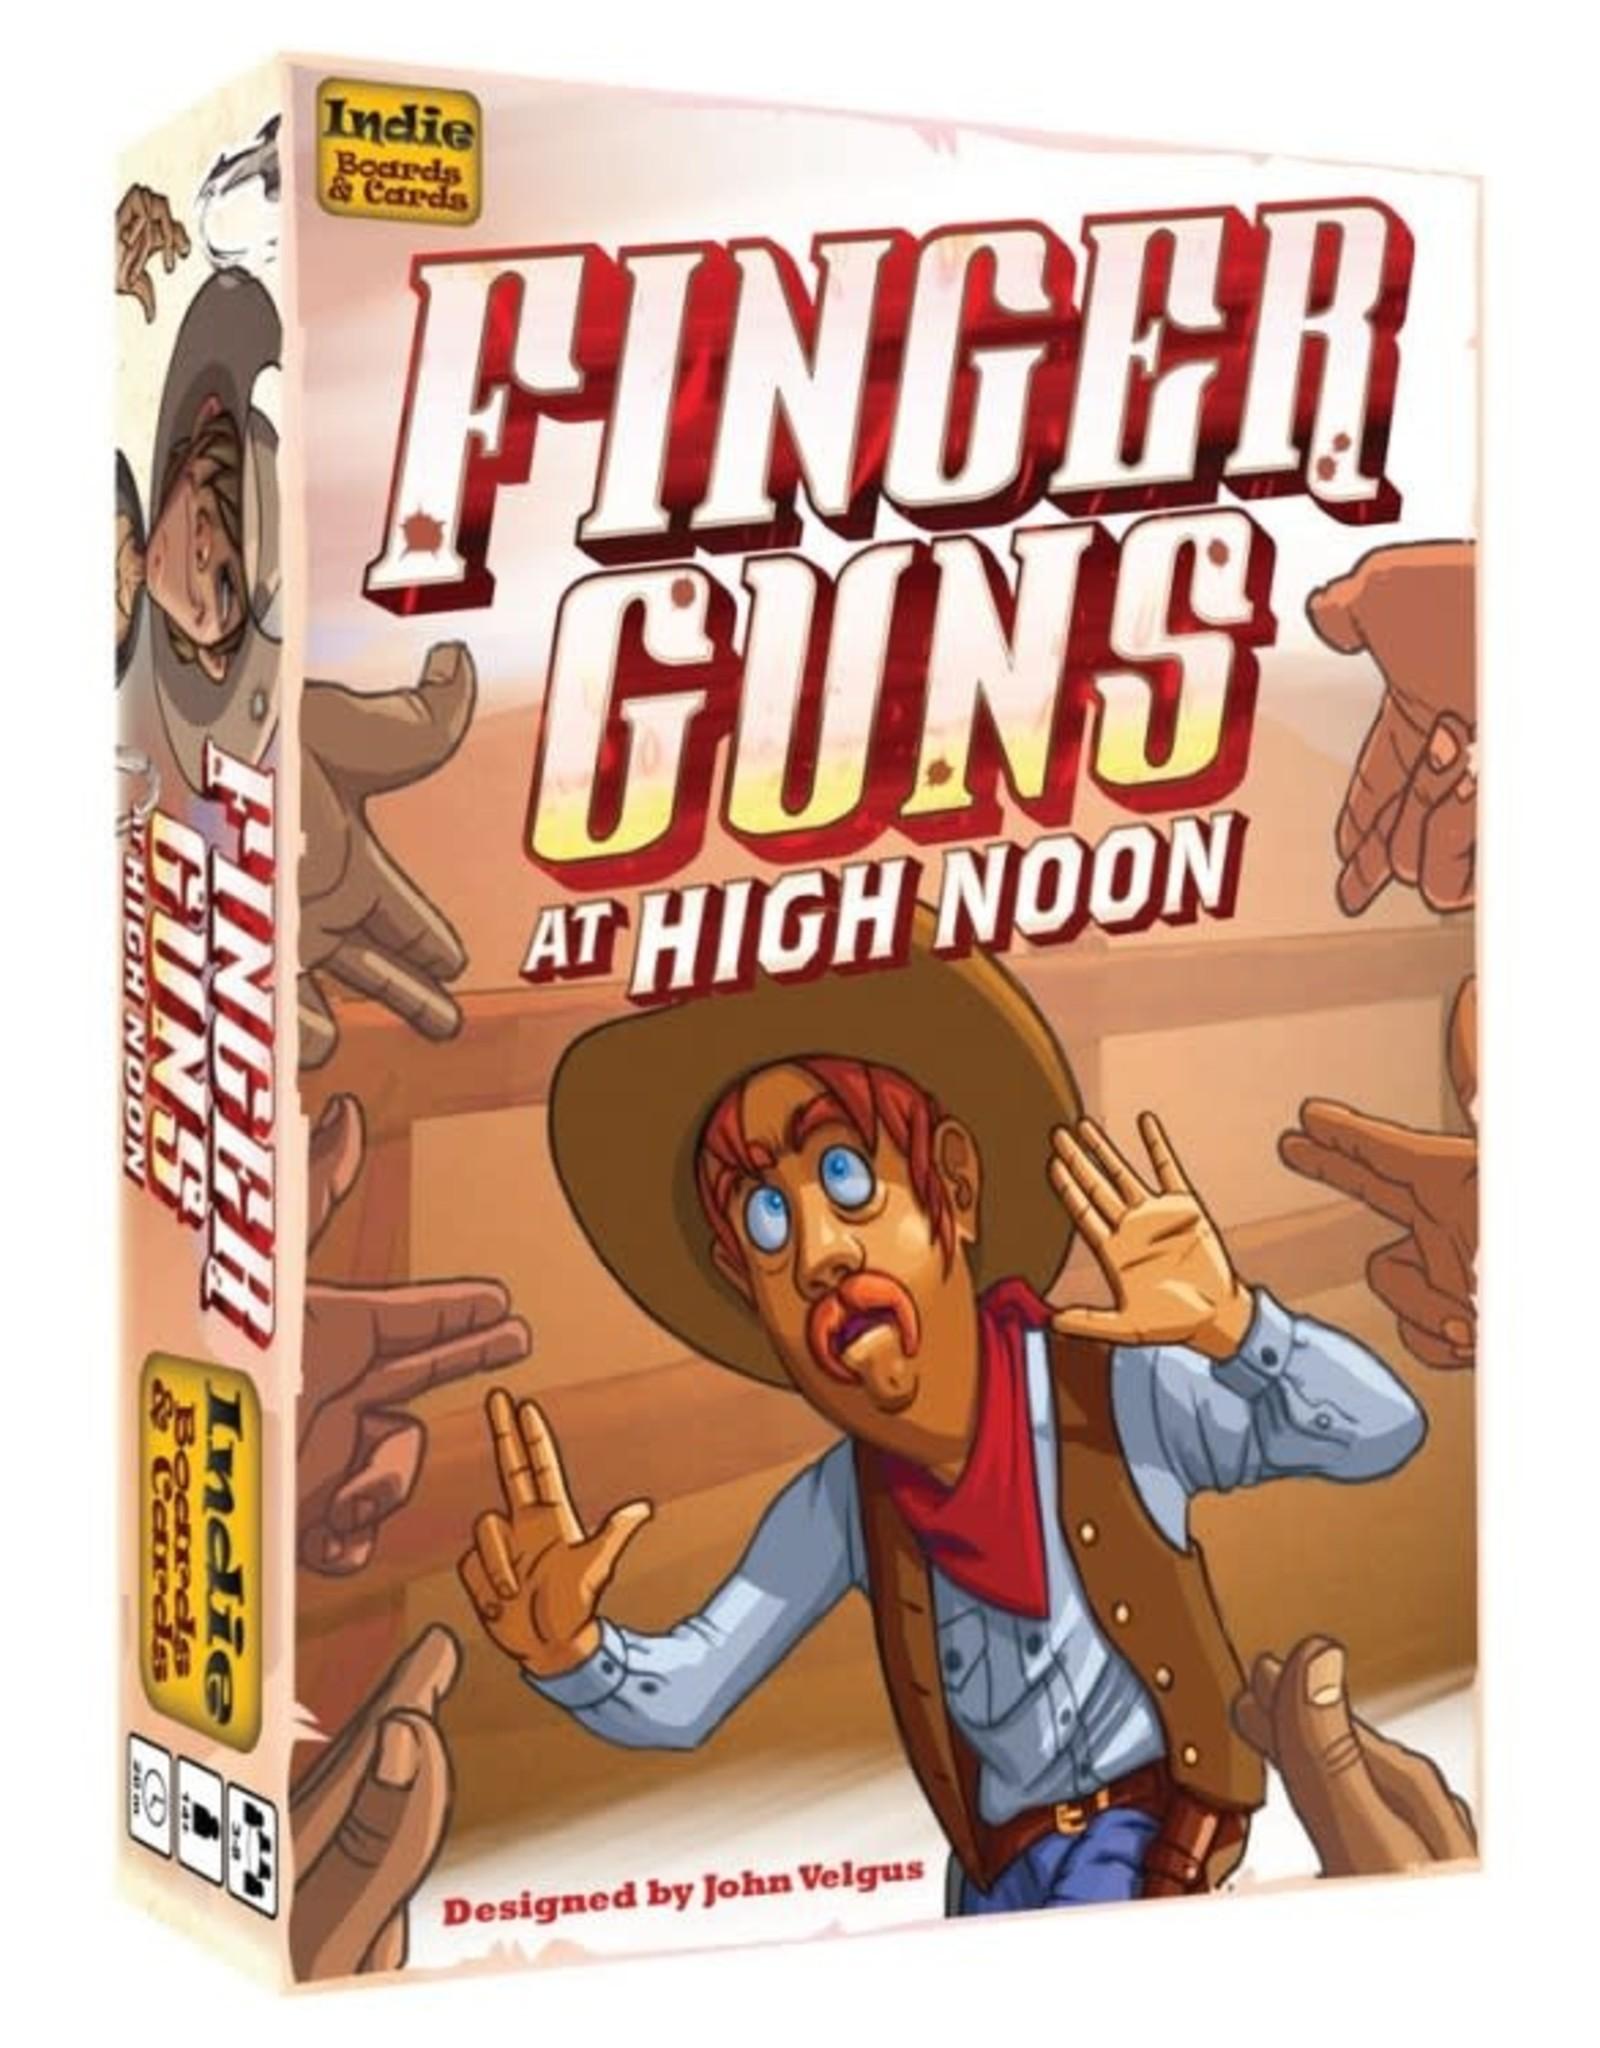 RENTAL - Finger Guns at High Noon 8.3oz